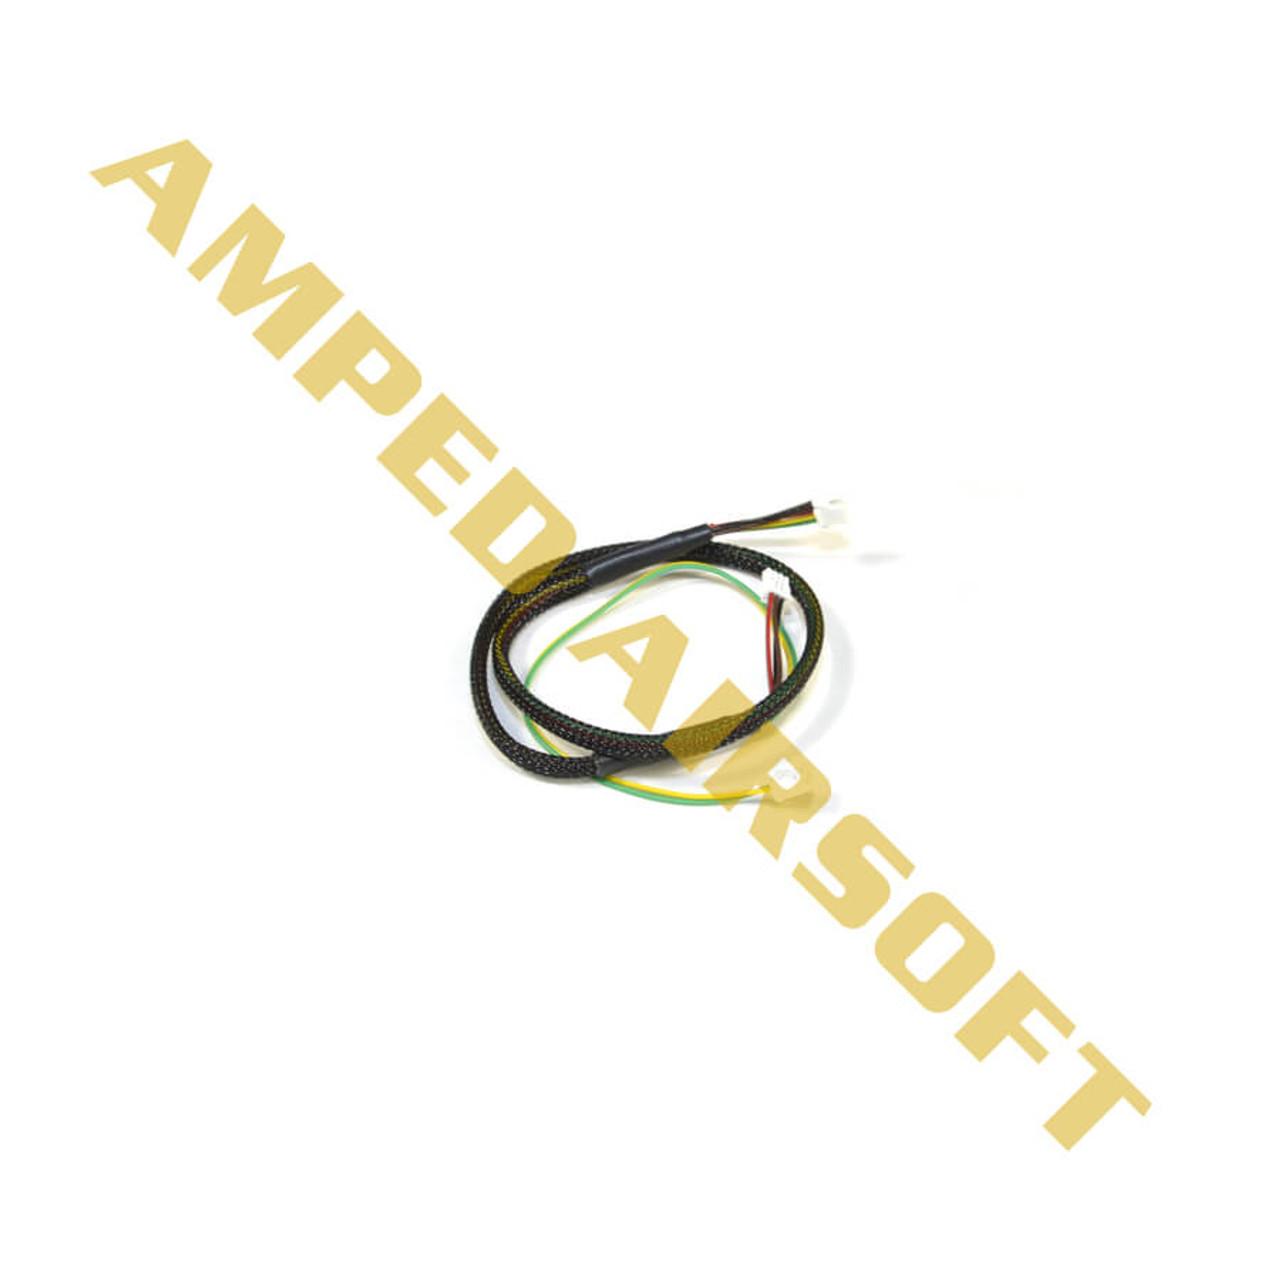 wiring wolverine airsoft v2 m4 14 inch wire harness__38884.1470675371?c=2 wolverine airsoft wireharness (gen2 v2 14\